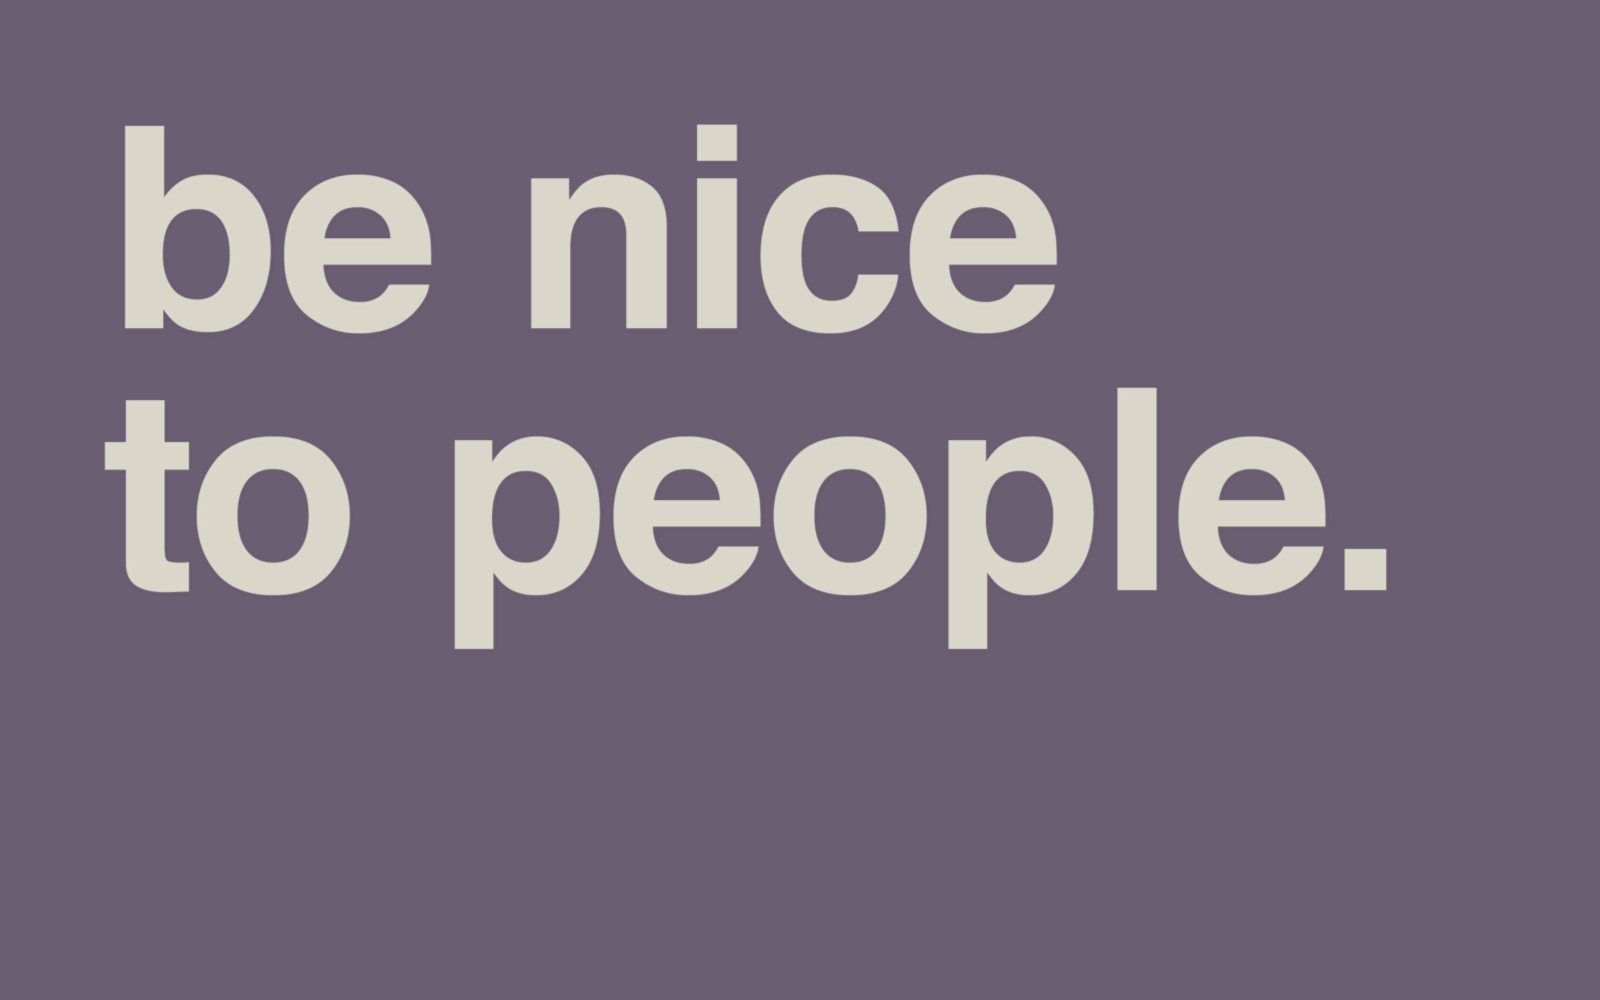 Servers' Sage Advise: Do Unto Others…